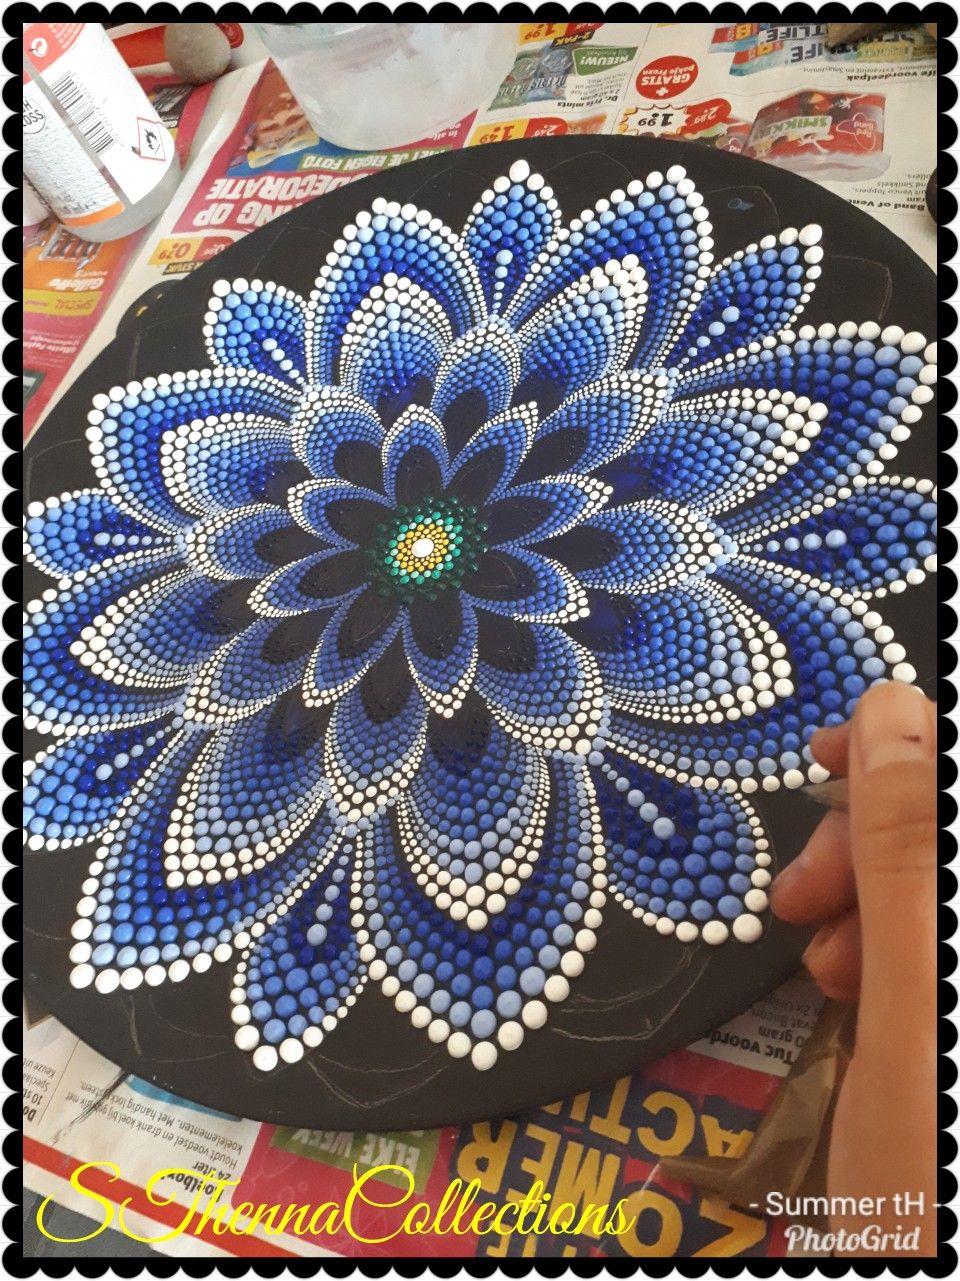 Pin von Joyce Knight auf Rock mandalas and point | Pinterest | Leinwand